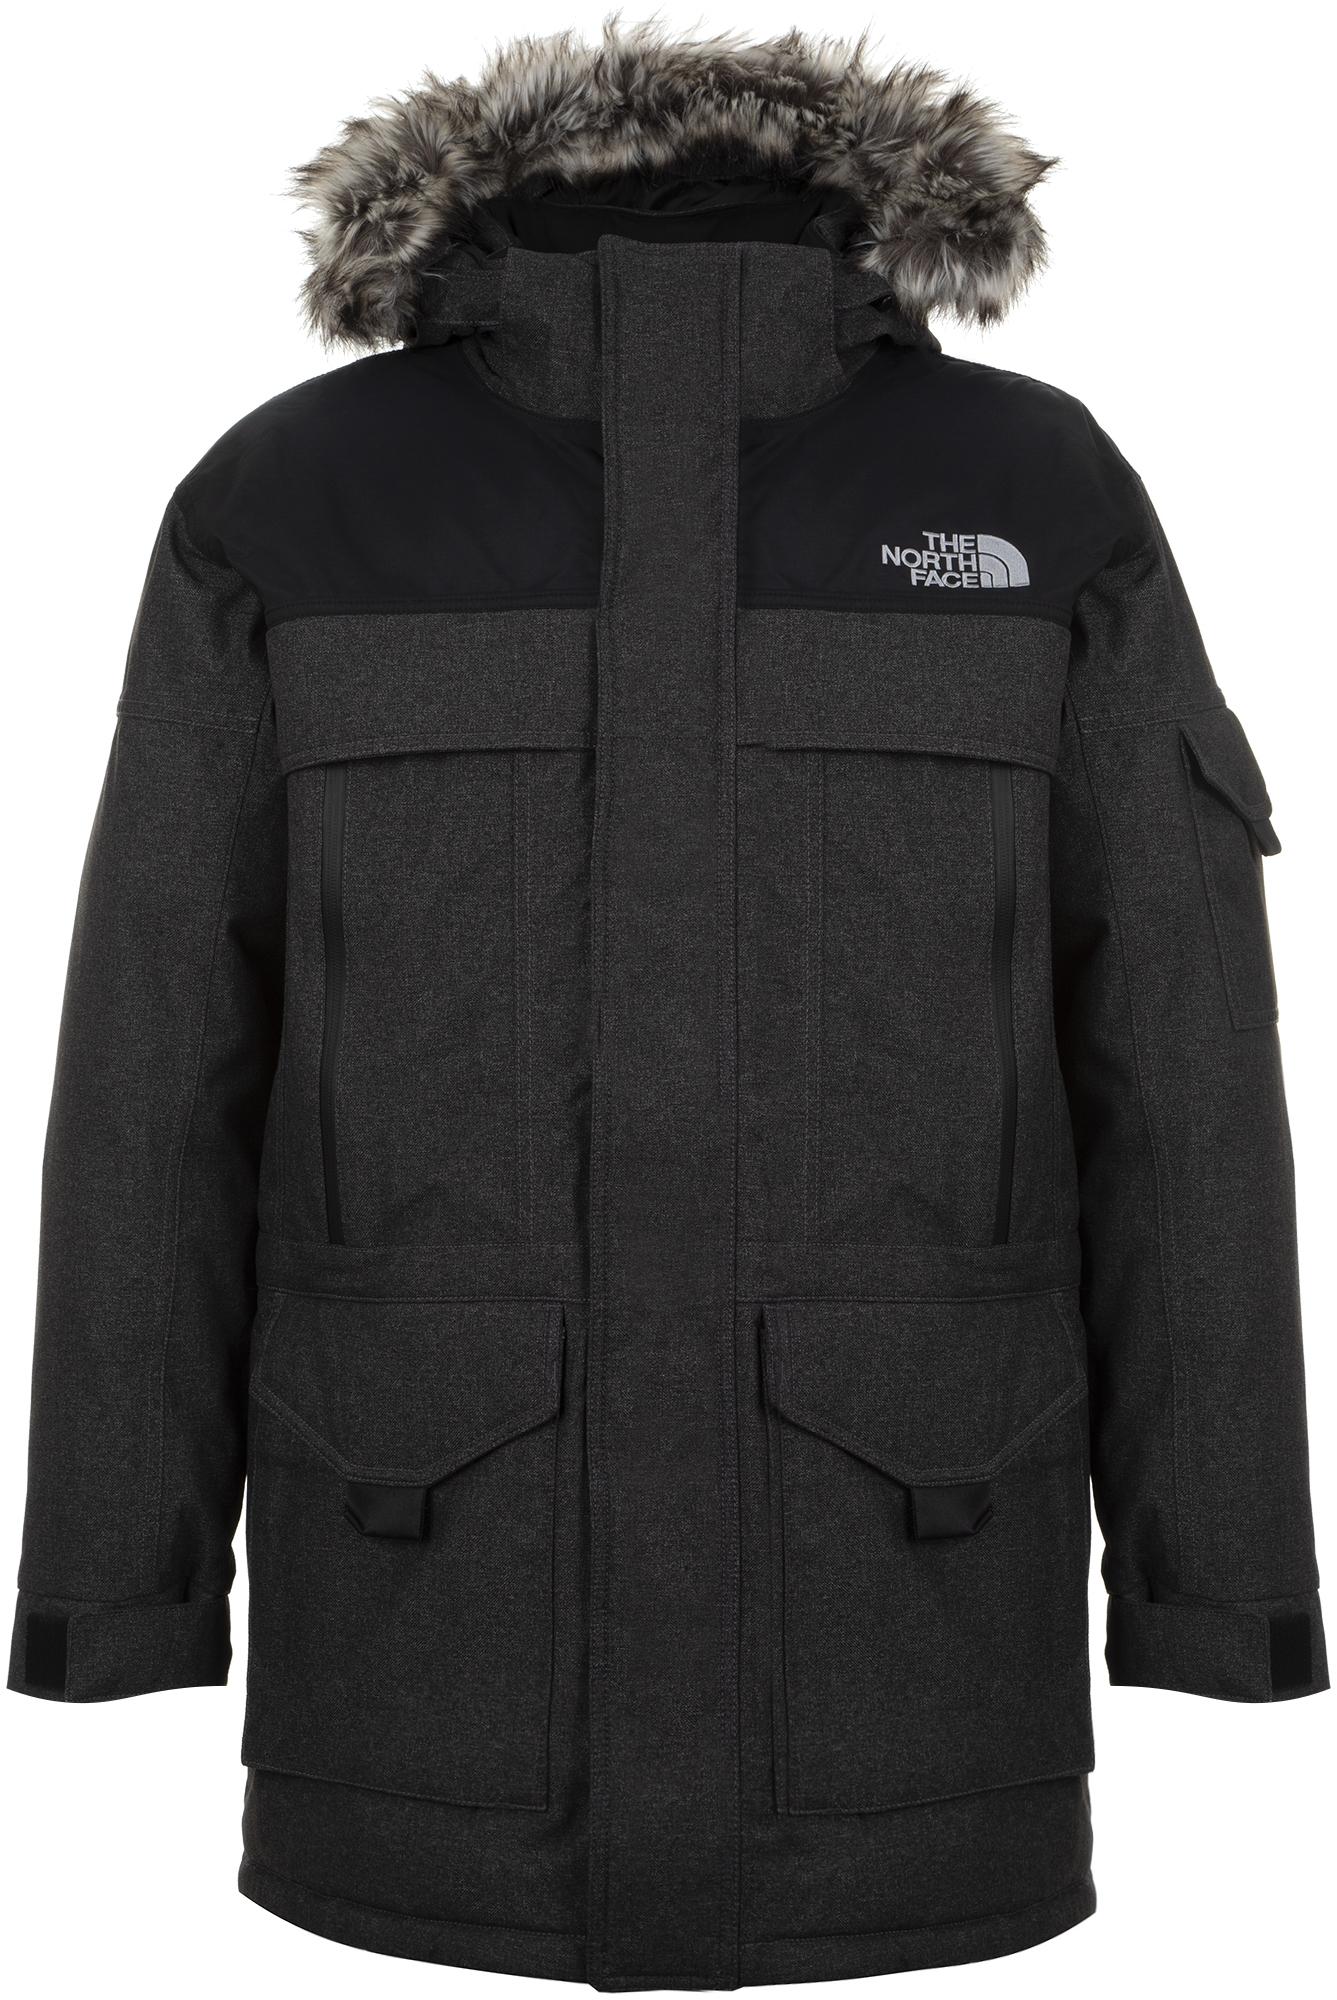 The North Face Куртка пуховая мужская The North Face Mc Murdo 2, размер 50